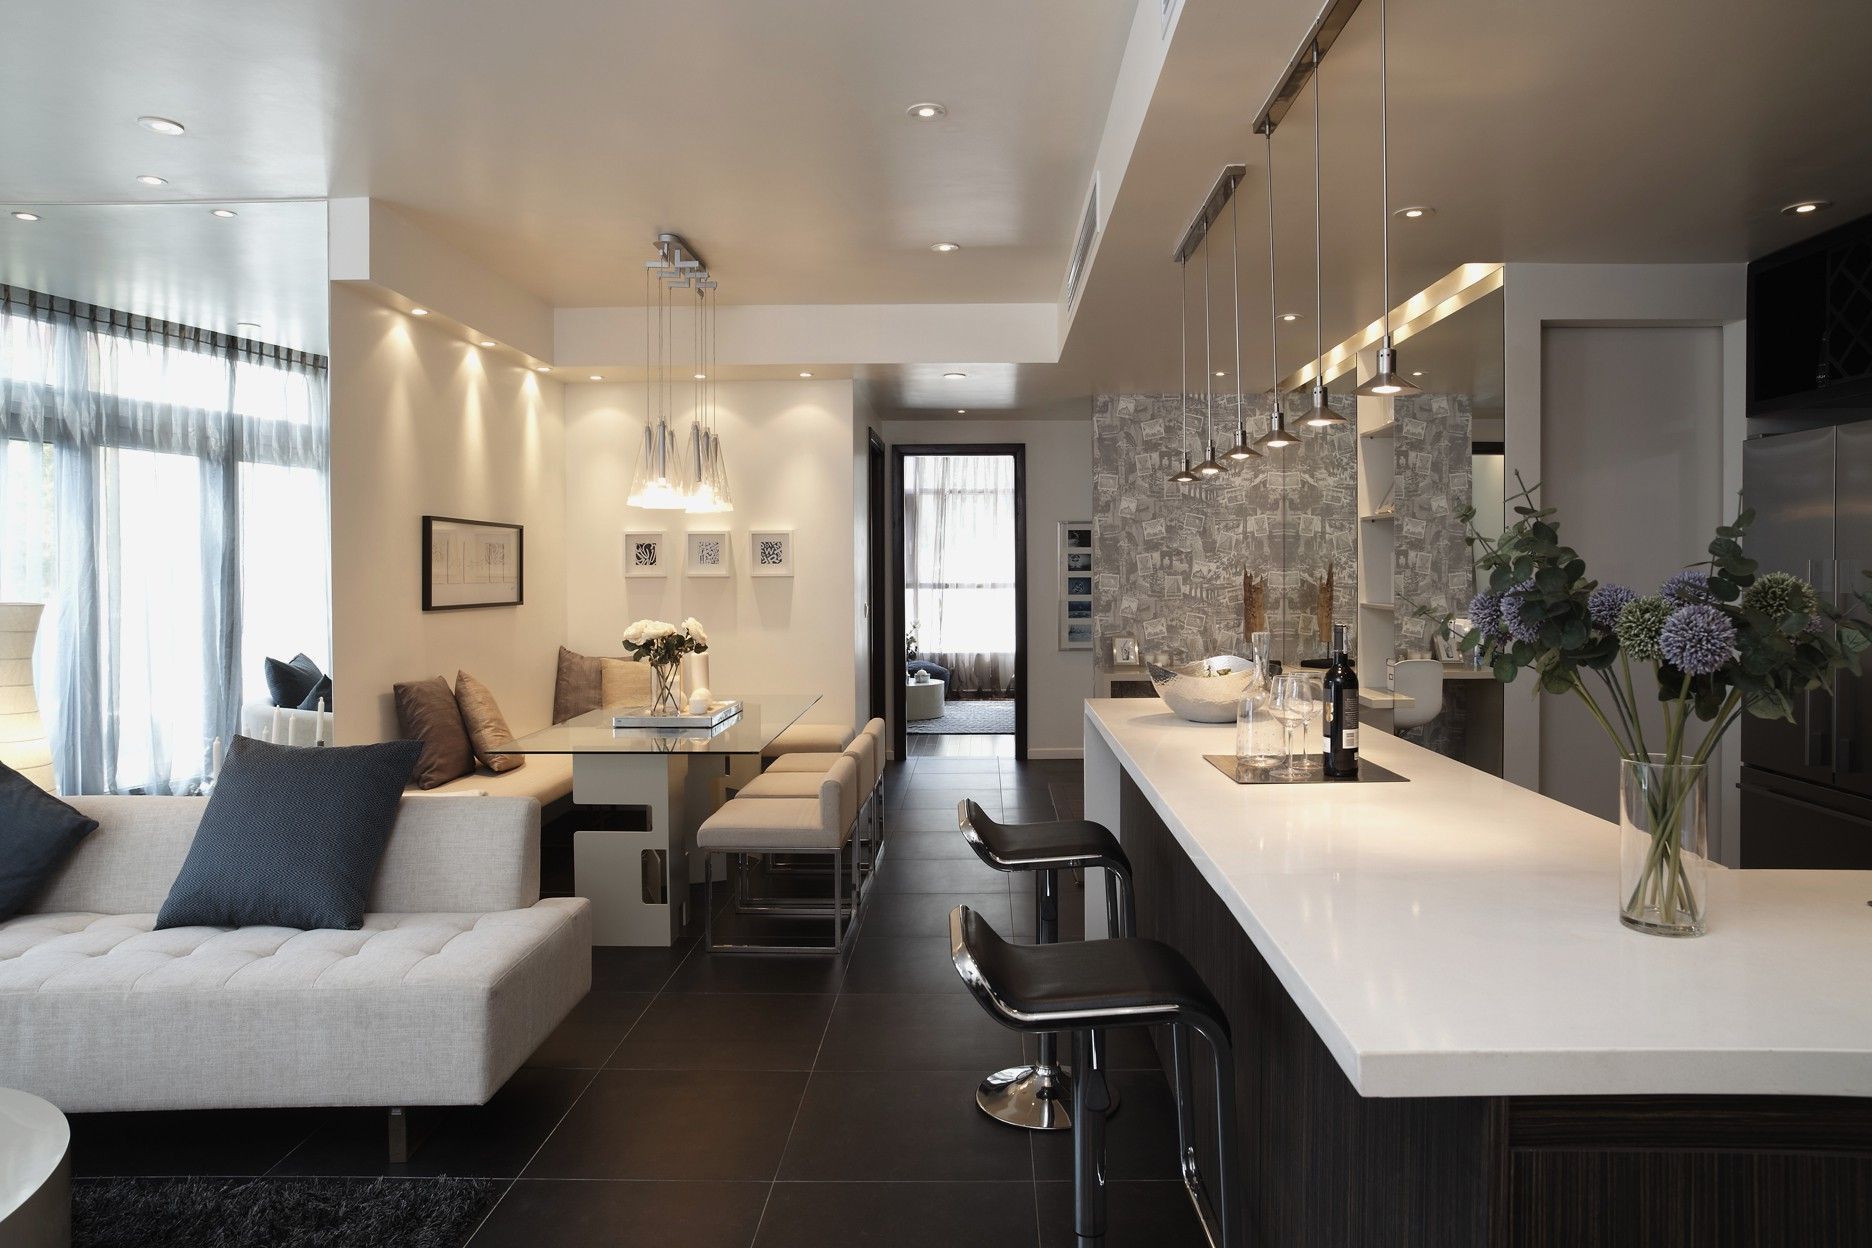 1 Schlafzimmer Apt Deko Ideen Rental Home Decor Apartment Room Renting A House